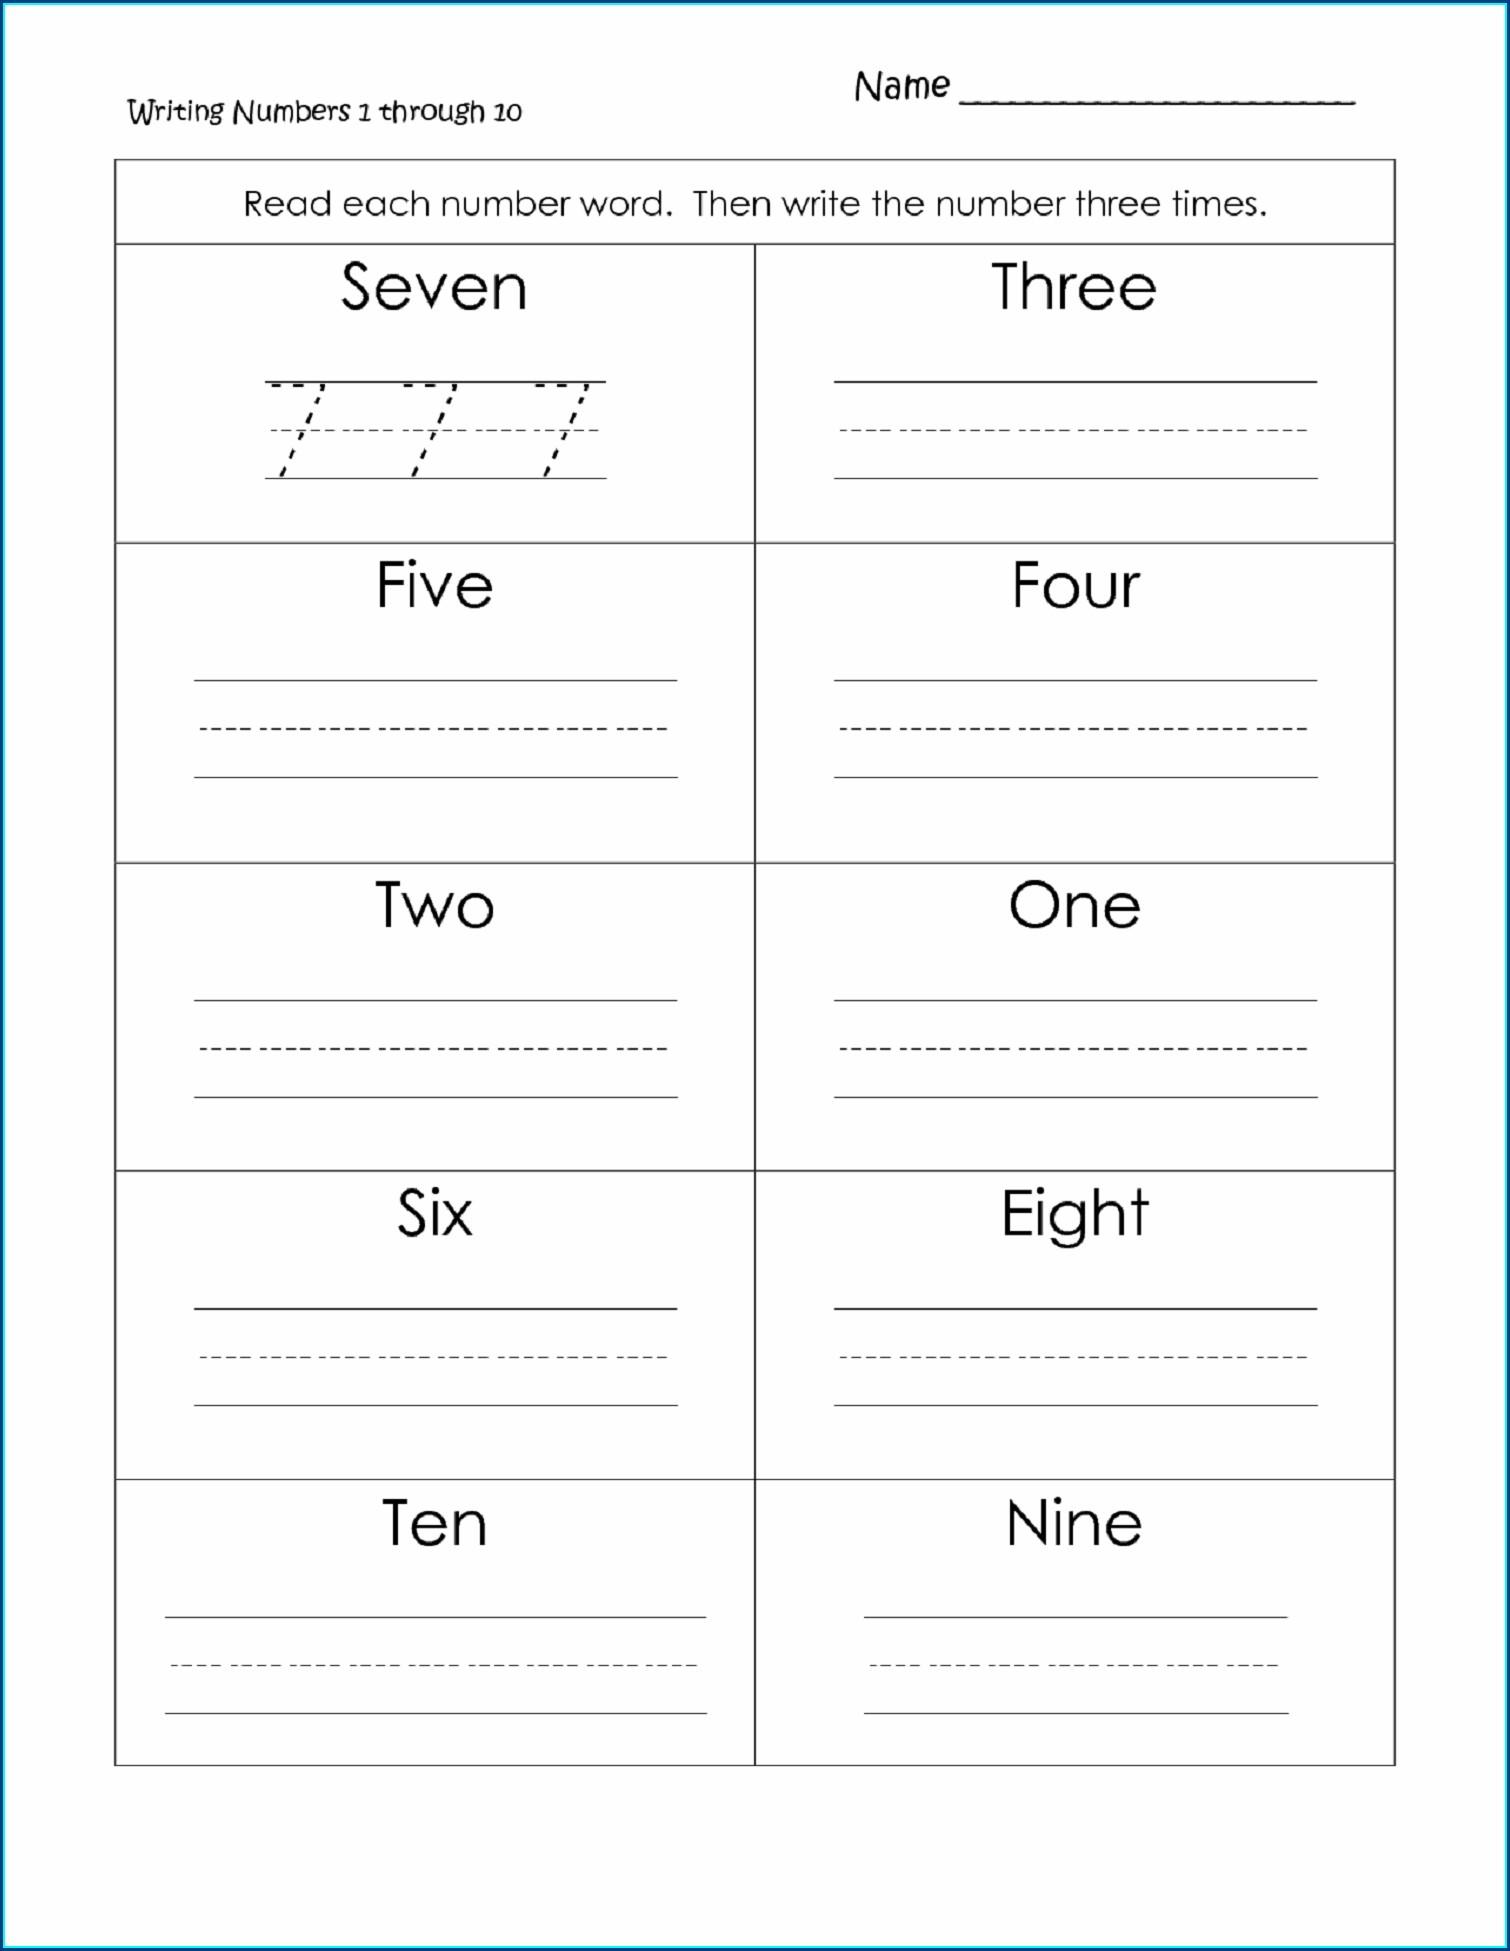 Writing Number Names Worksheet For Grade 1